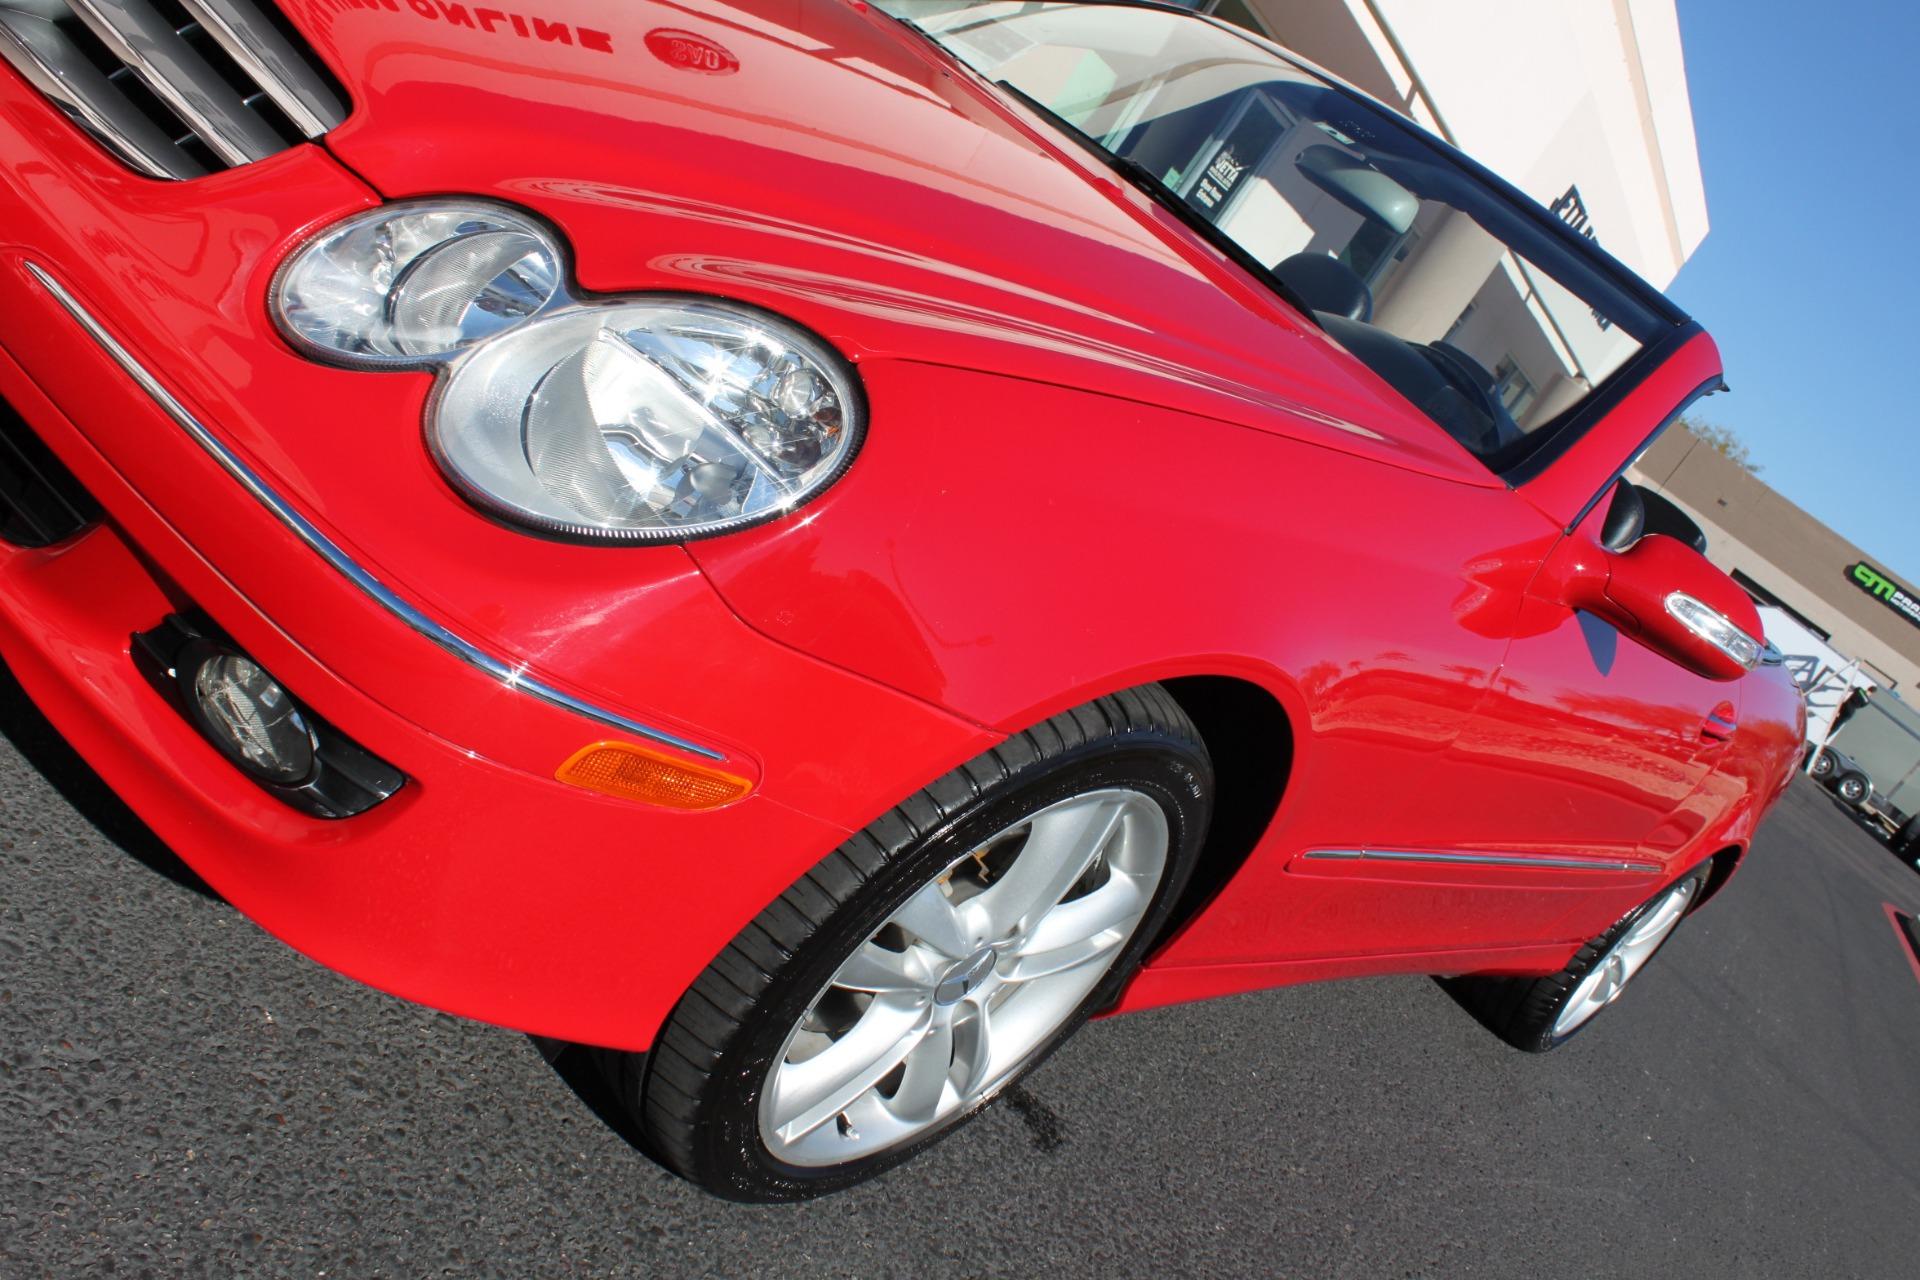 Used-2006-Mercedes-Benz-CLK-Class-CLK350-Cabriolet-35L-Grand-Cherokee